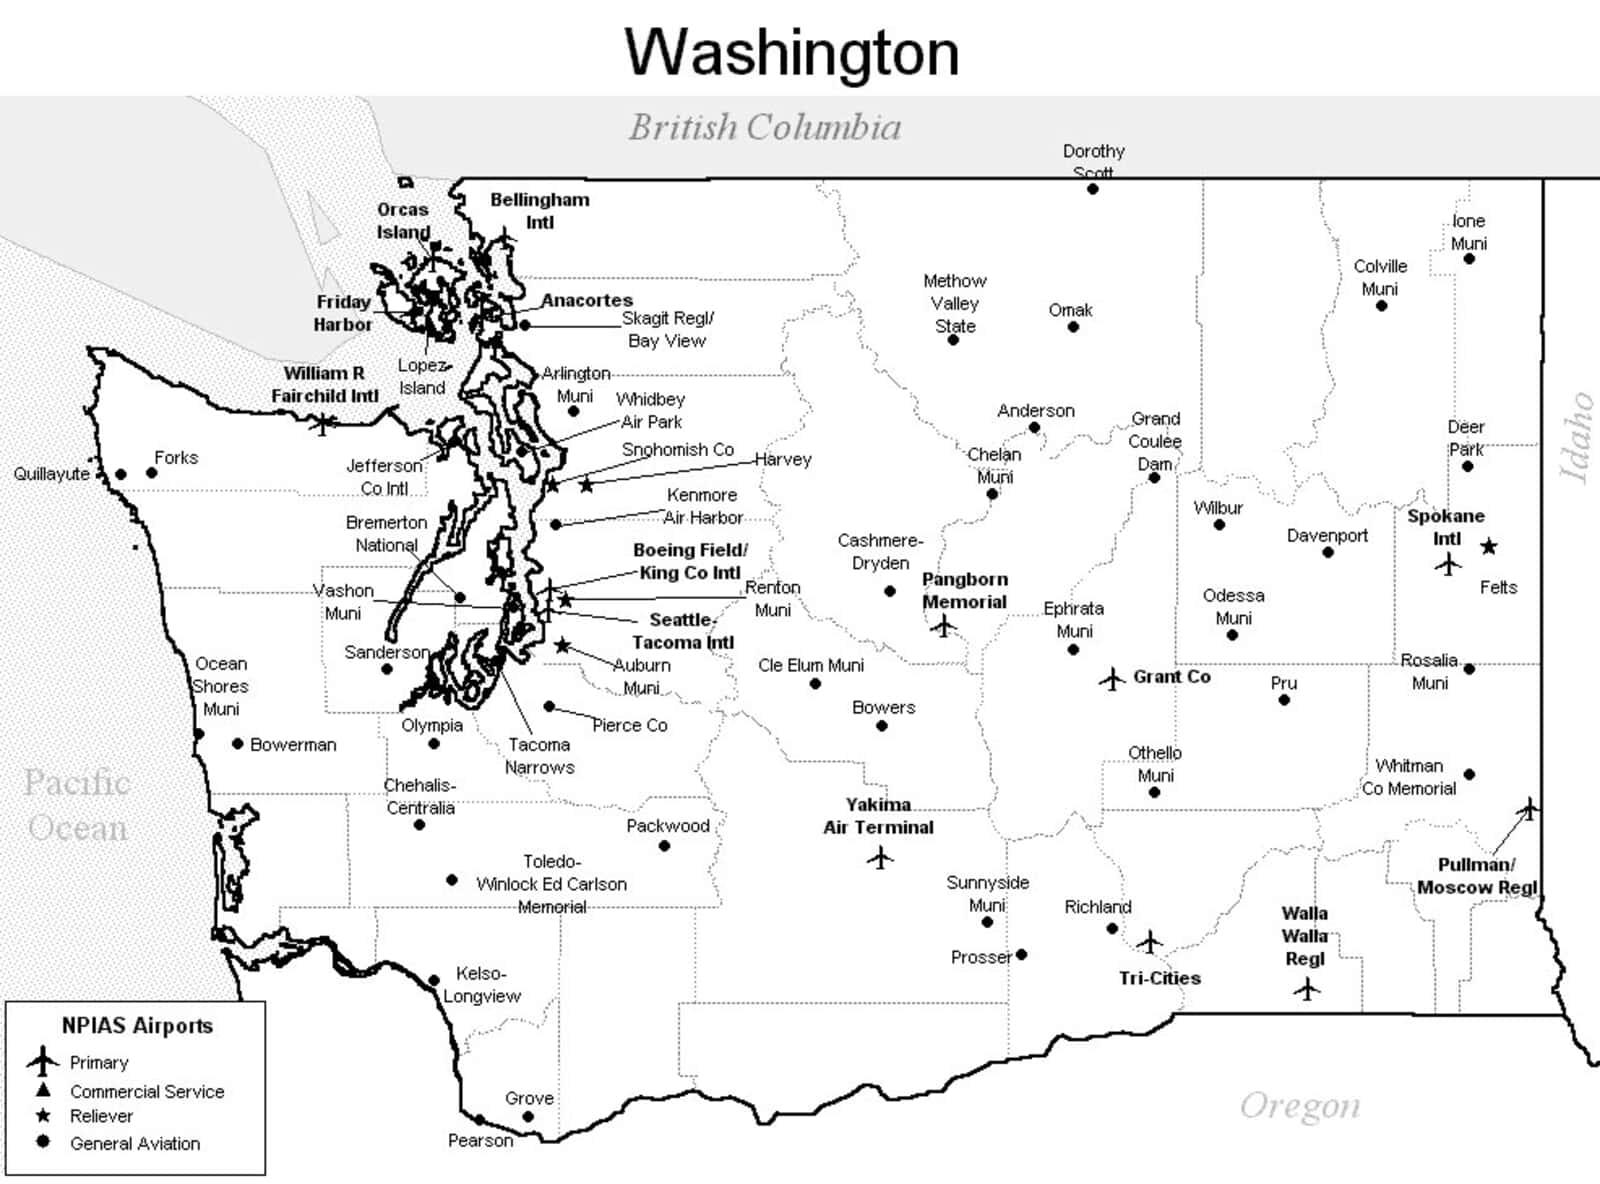 Washington Airport Map - Washington Airports